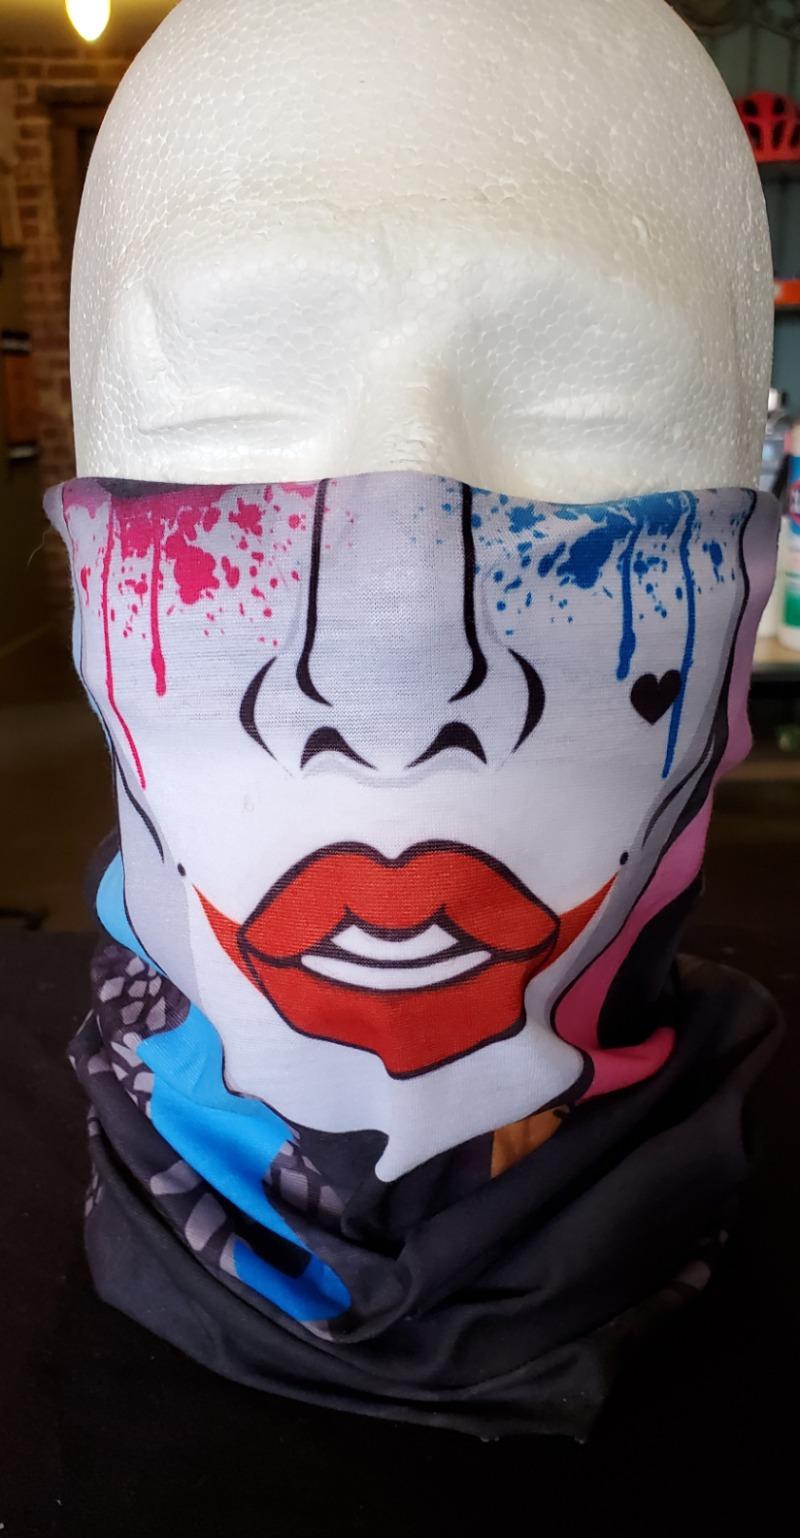 Face Wrap Harley Quinn Image